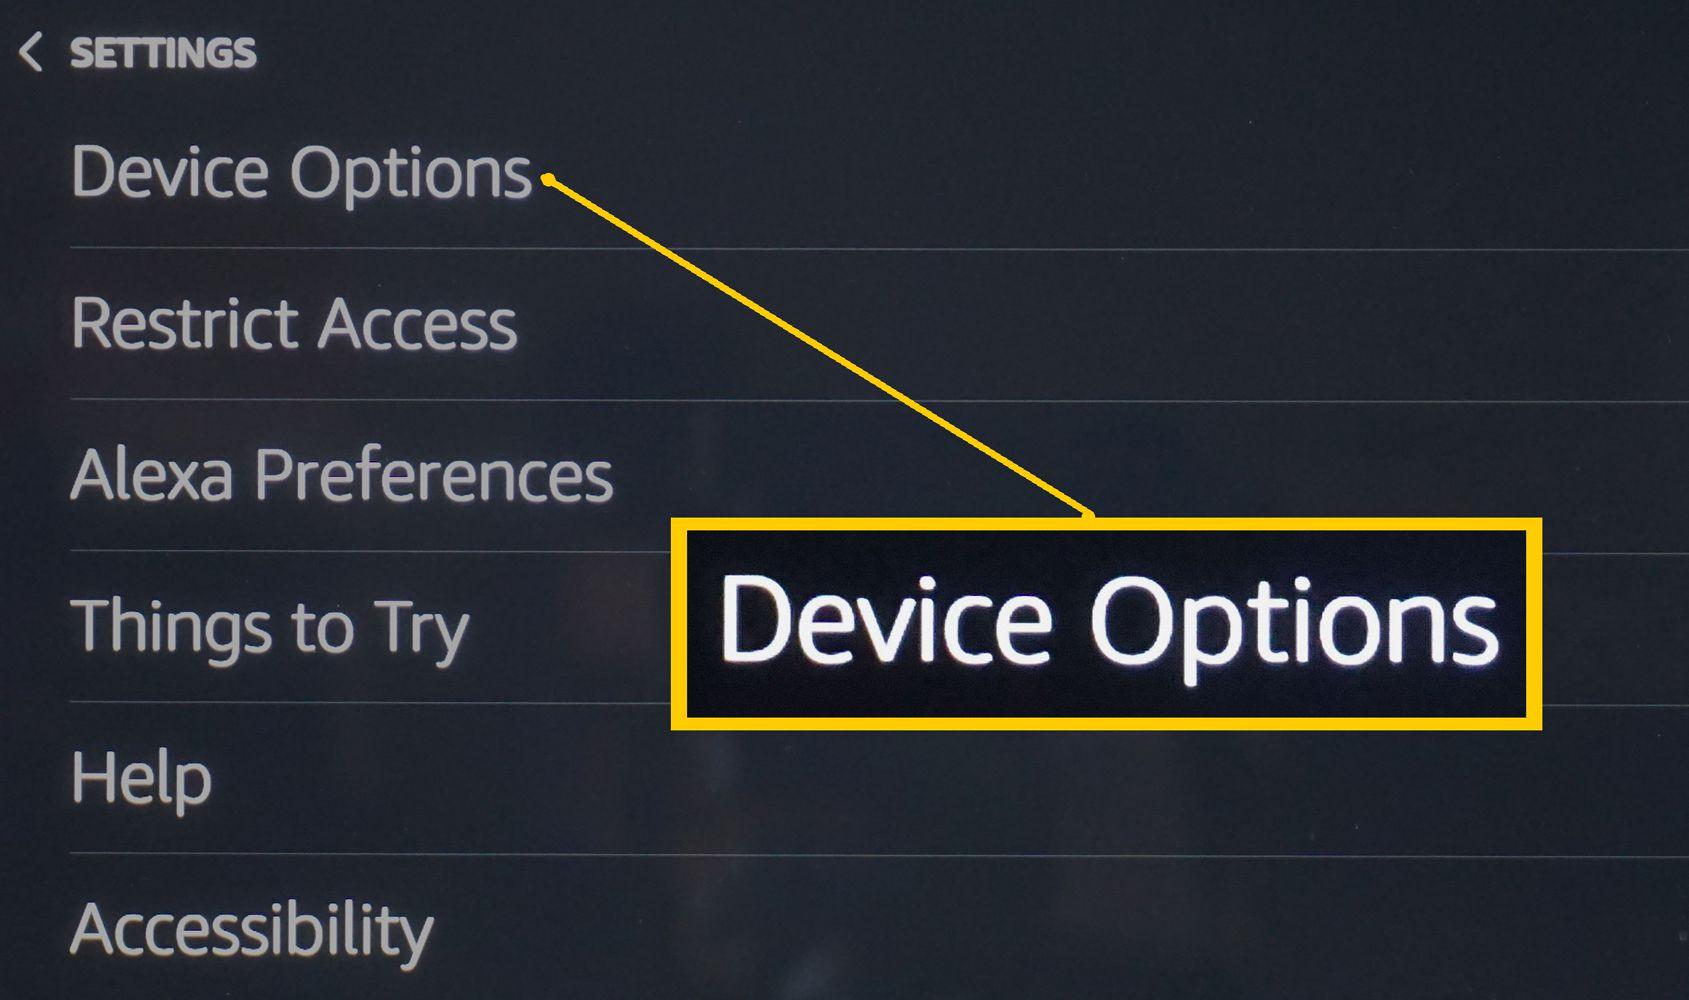 Echo Show – Settings Menu – Select Device Options